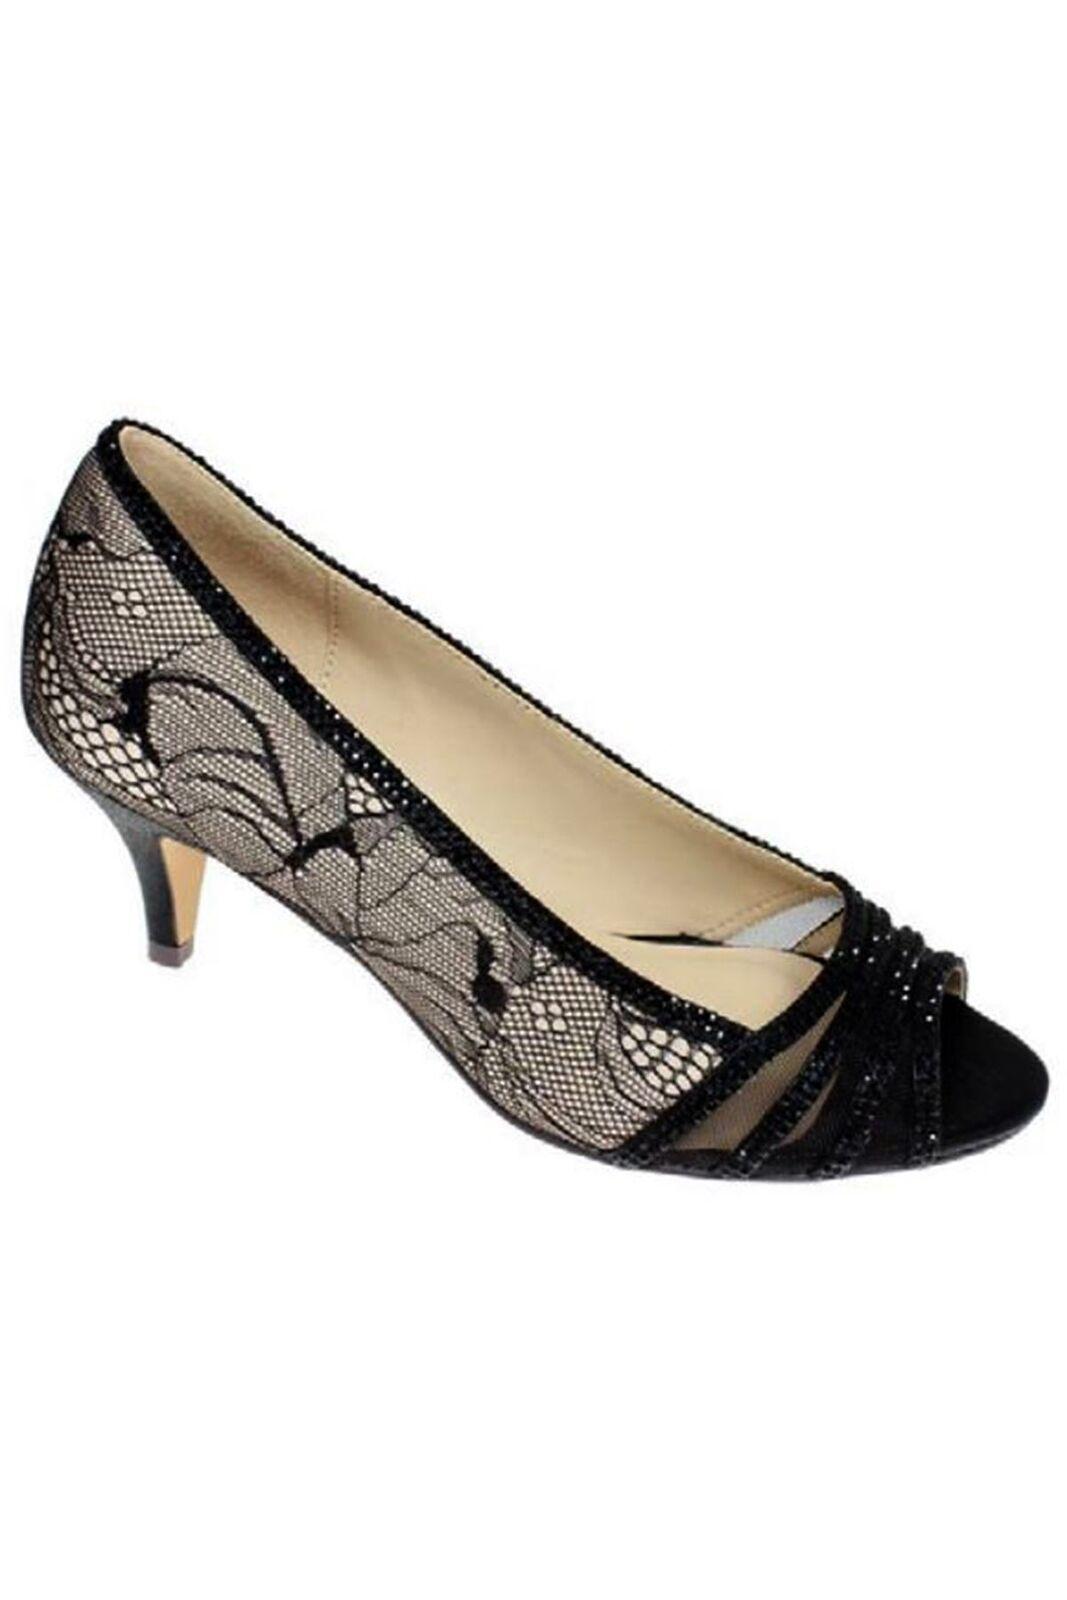 FLR438 Faith Low Heel Lace Detail diamante Peep Toe Clutch Bag Slip On Heels